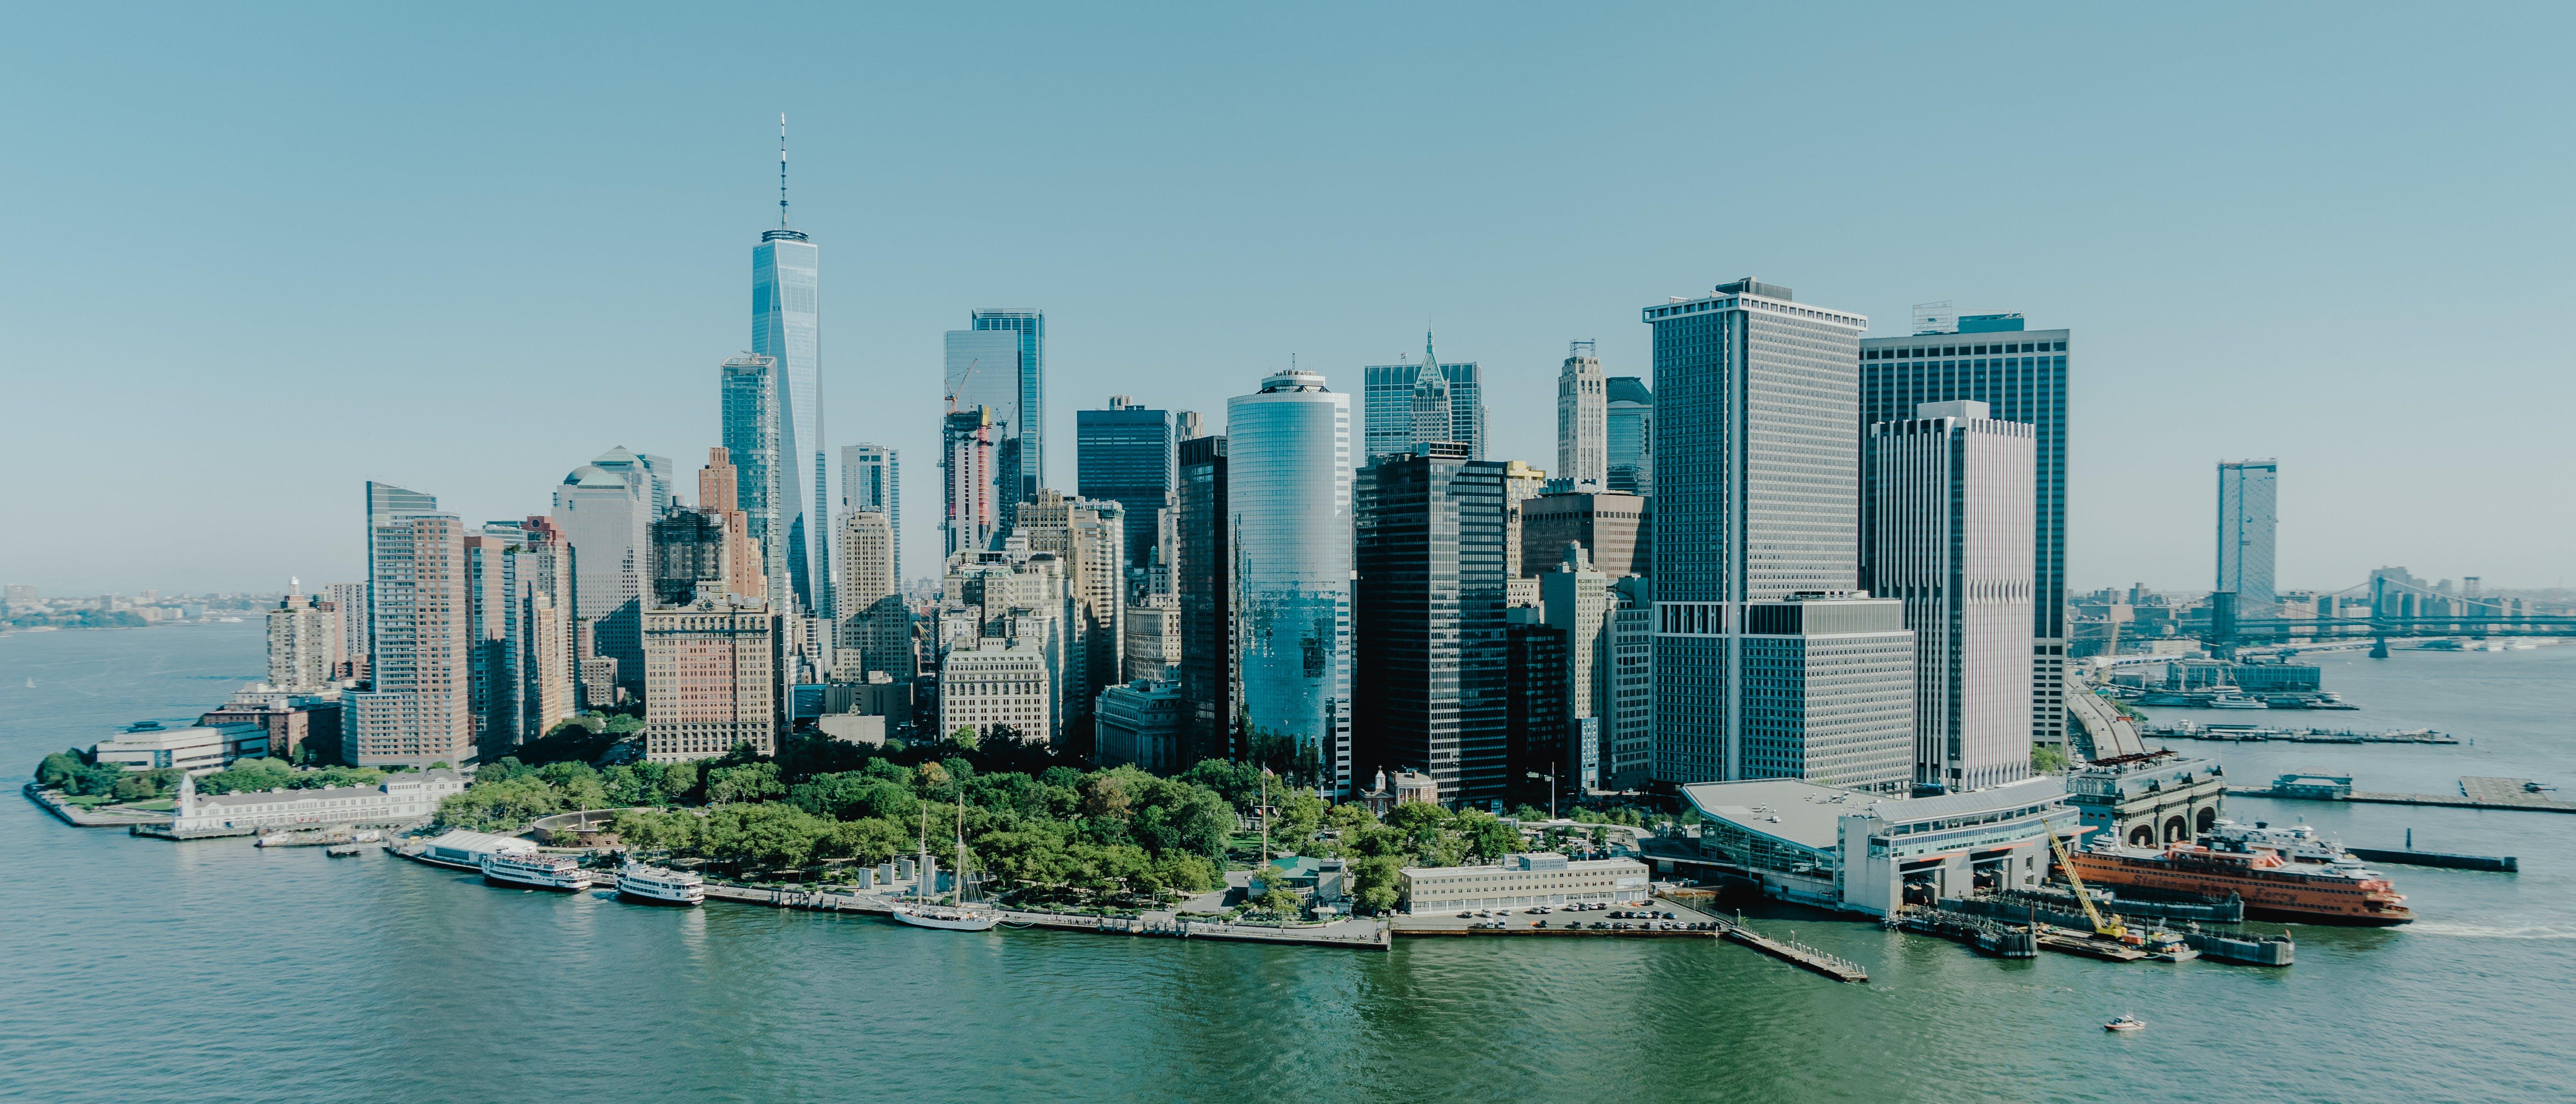 Free stock photo of cityscape, new york city, one world trade center, skyline